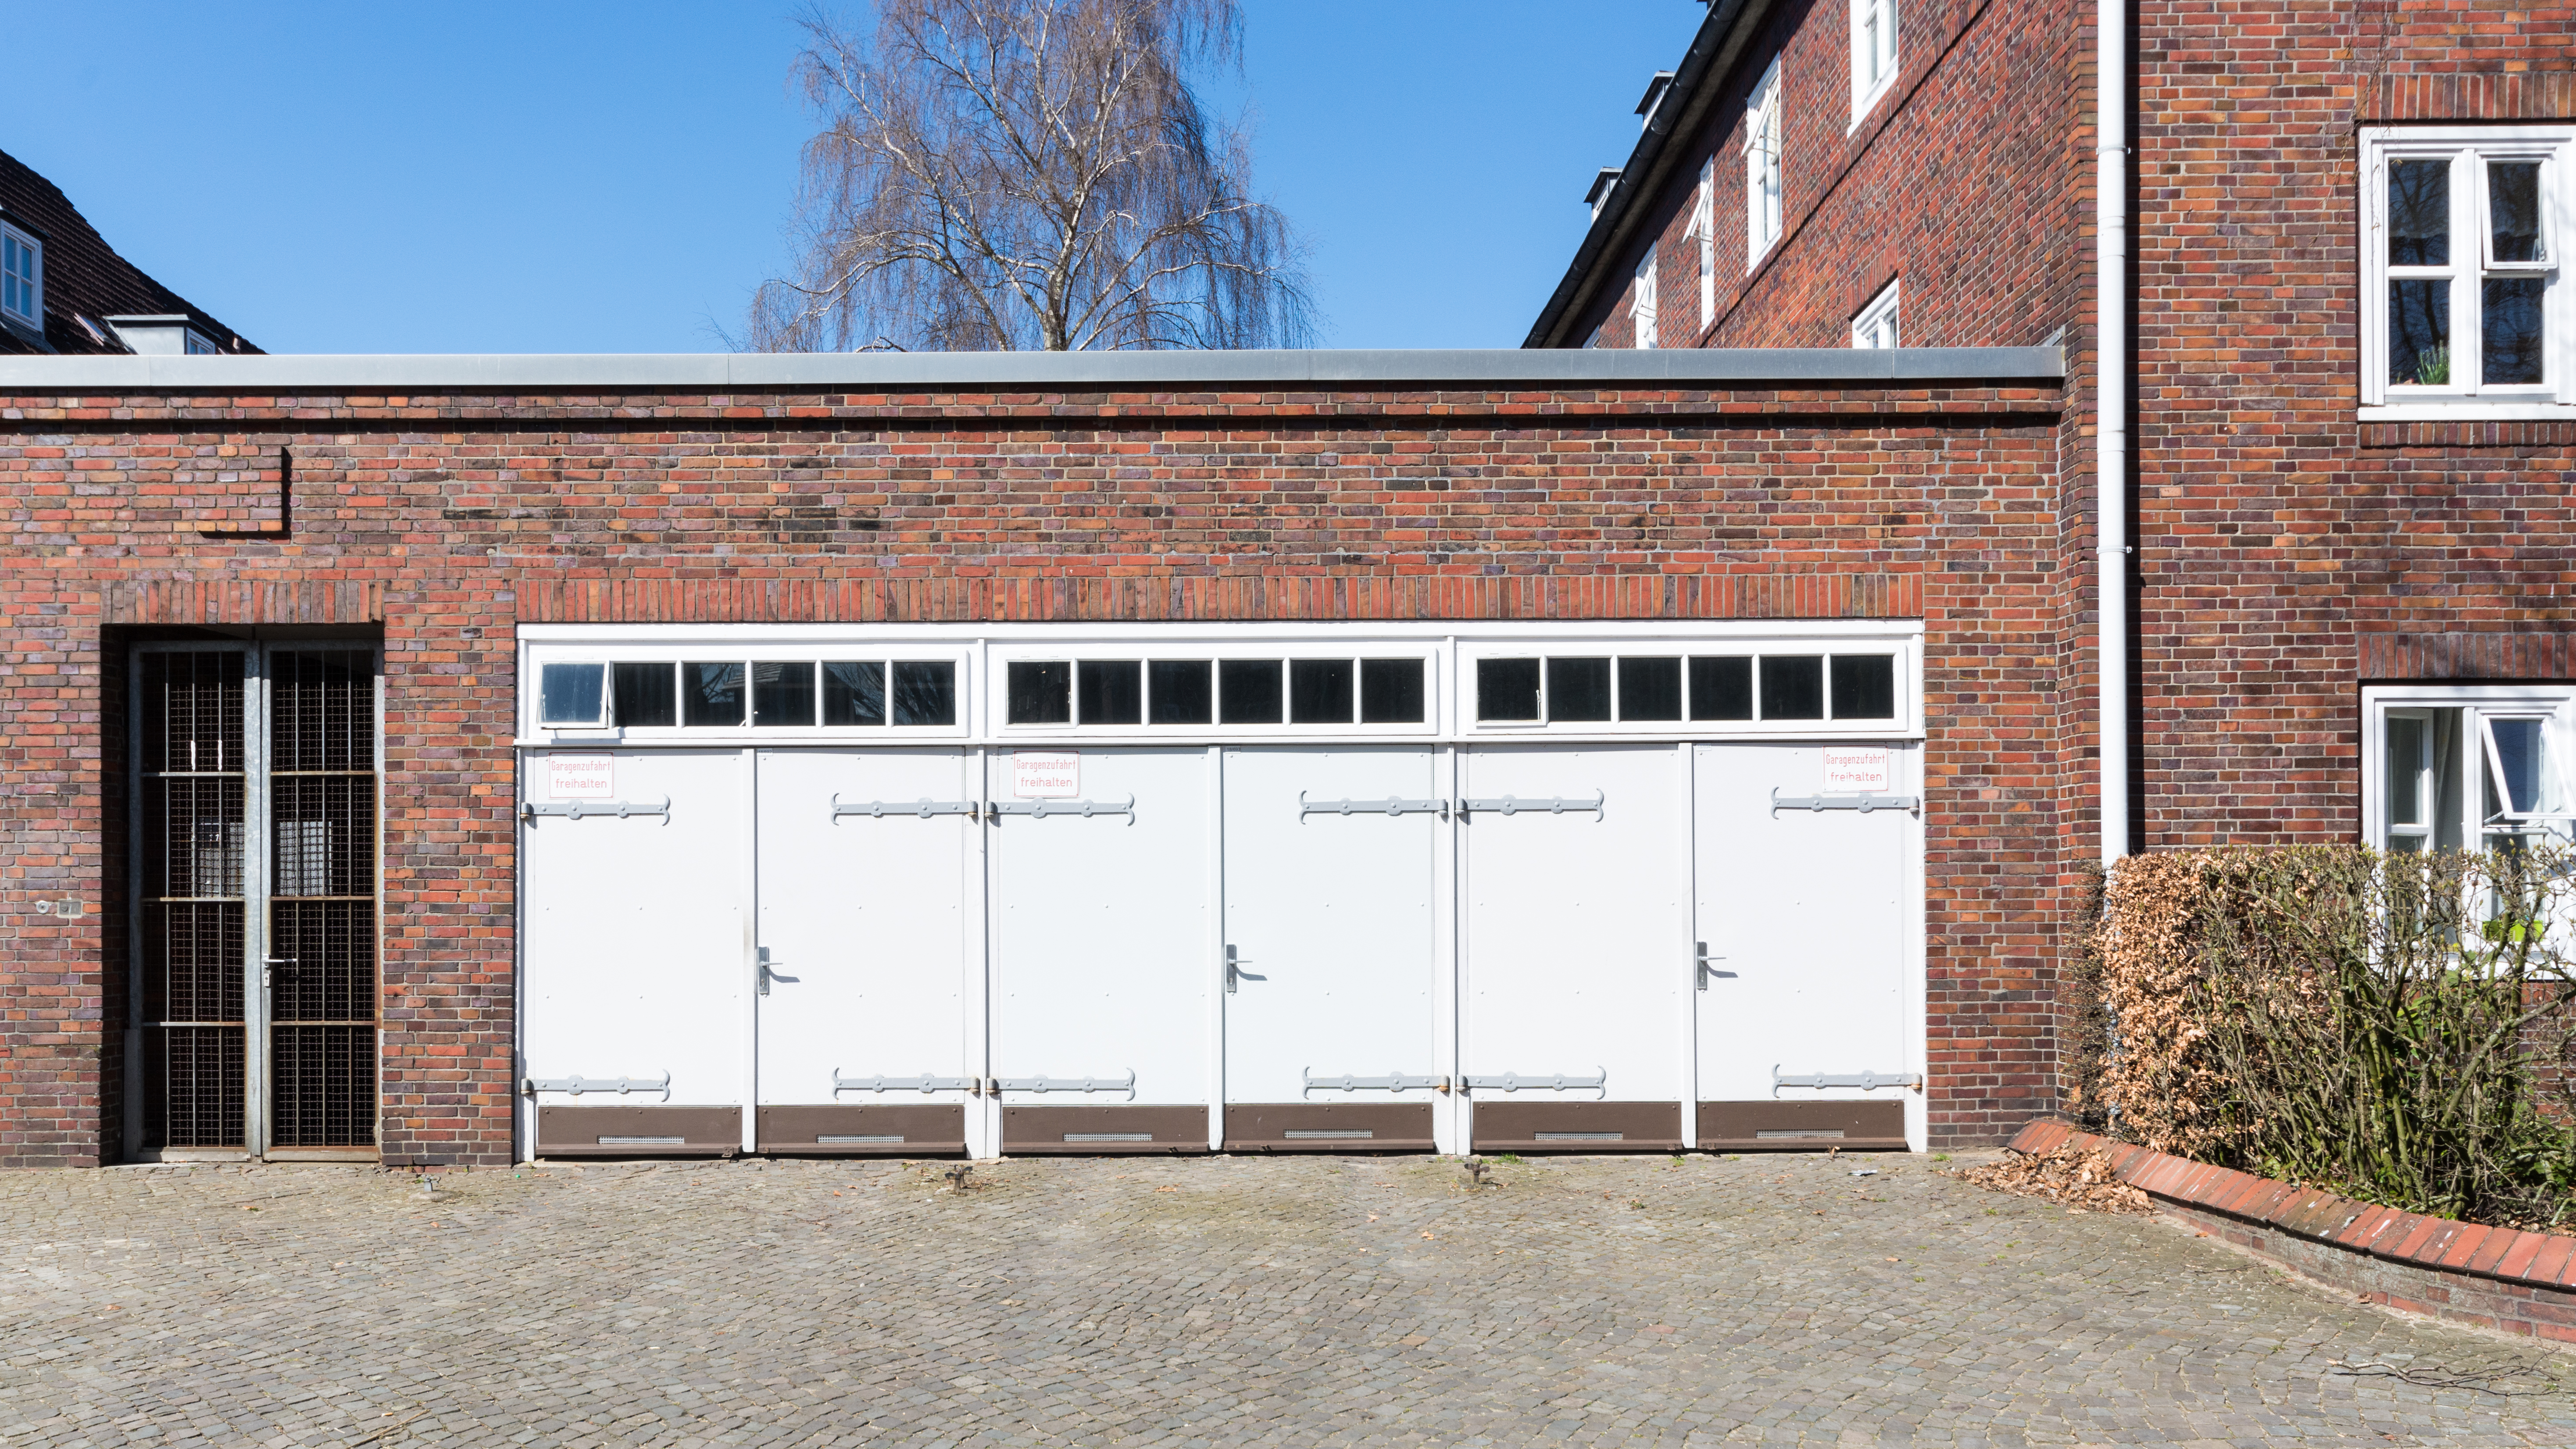 Filedulsberg nord hamburg dulsberg530915ajbg wikimedia filedulsberg nord hamburg dulsberg530915ajbg rubansaba